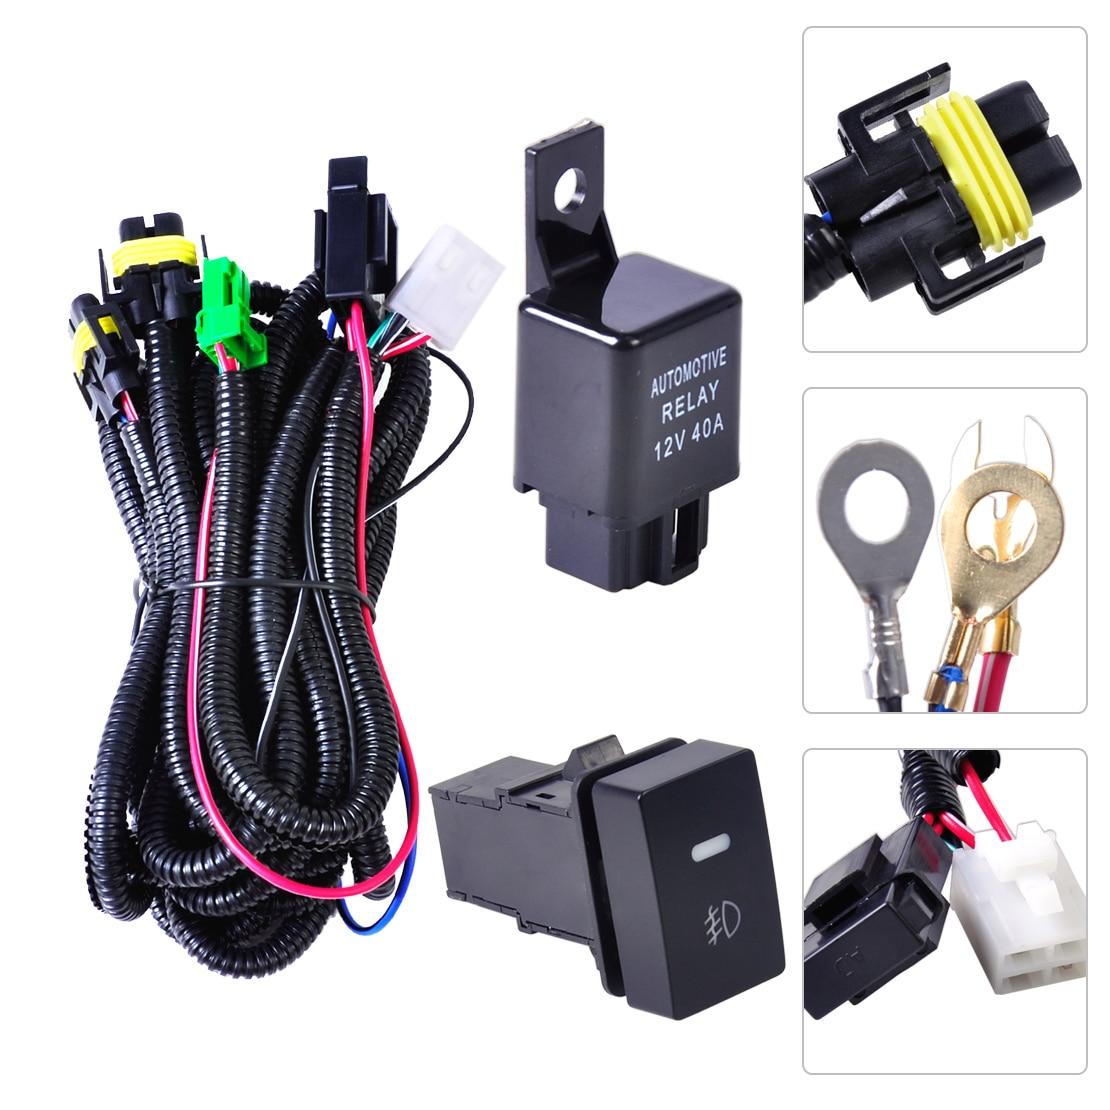 nissan pathfinder fog light wiring wiring diagram expert fog wiring install aftermarket switch to stock wiring nissan [ 1110 x 1110 Pixel ]